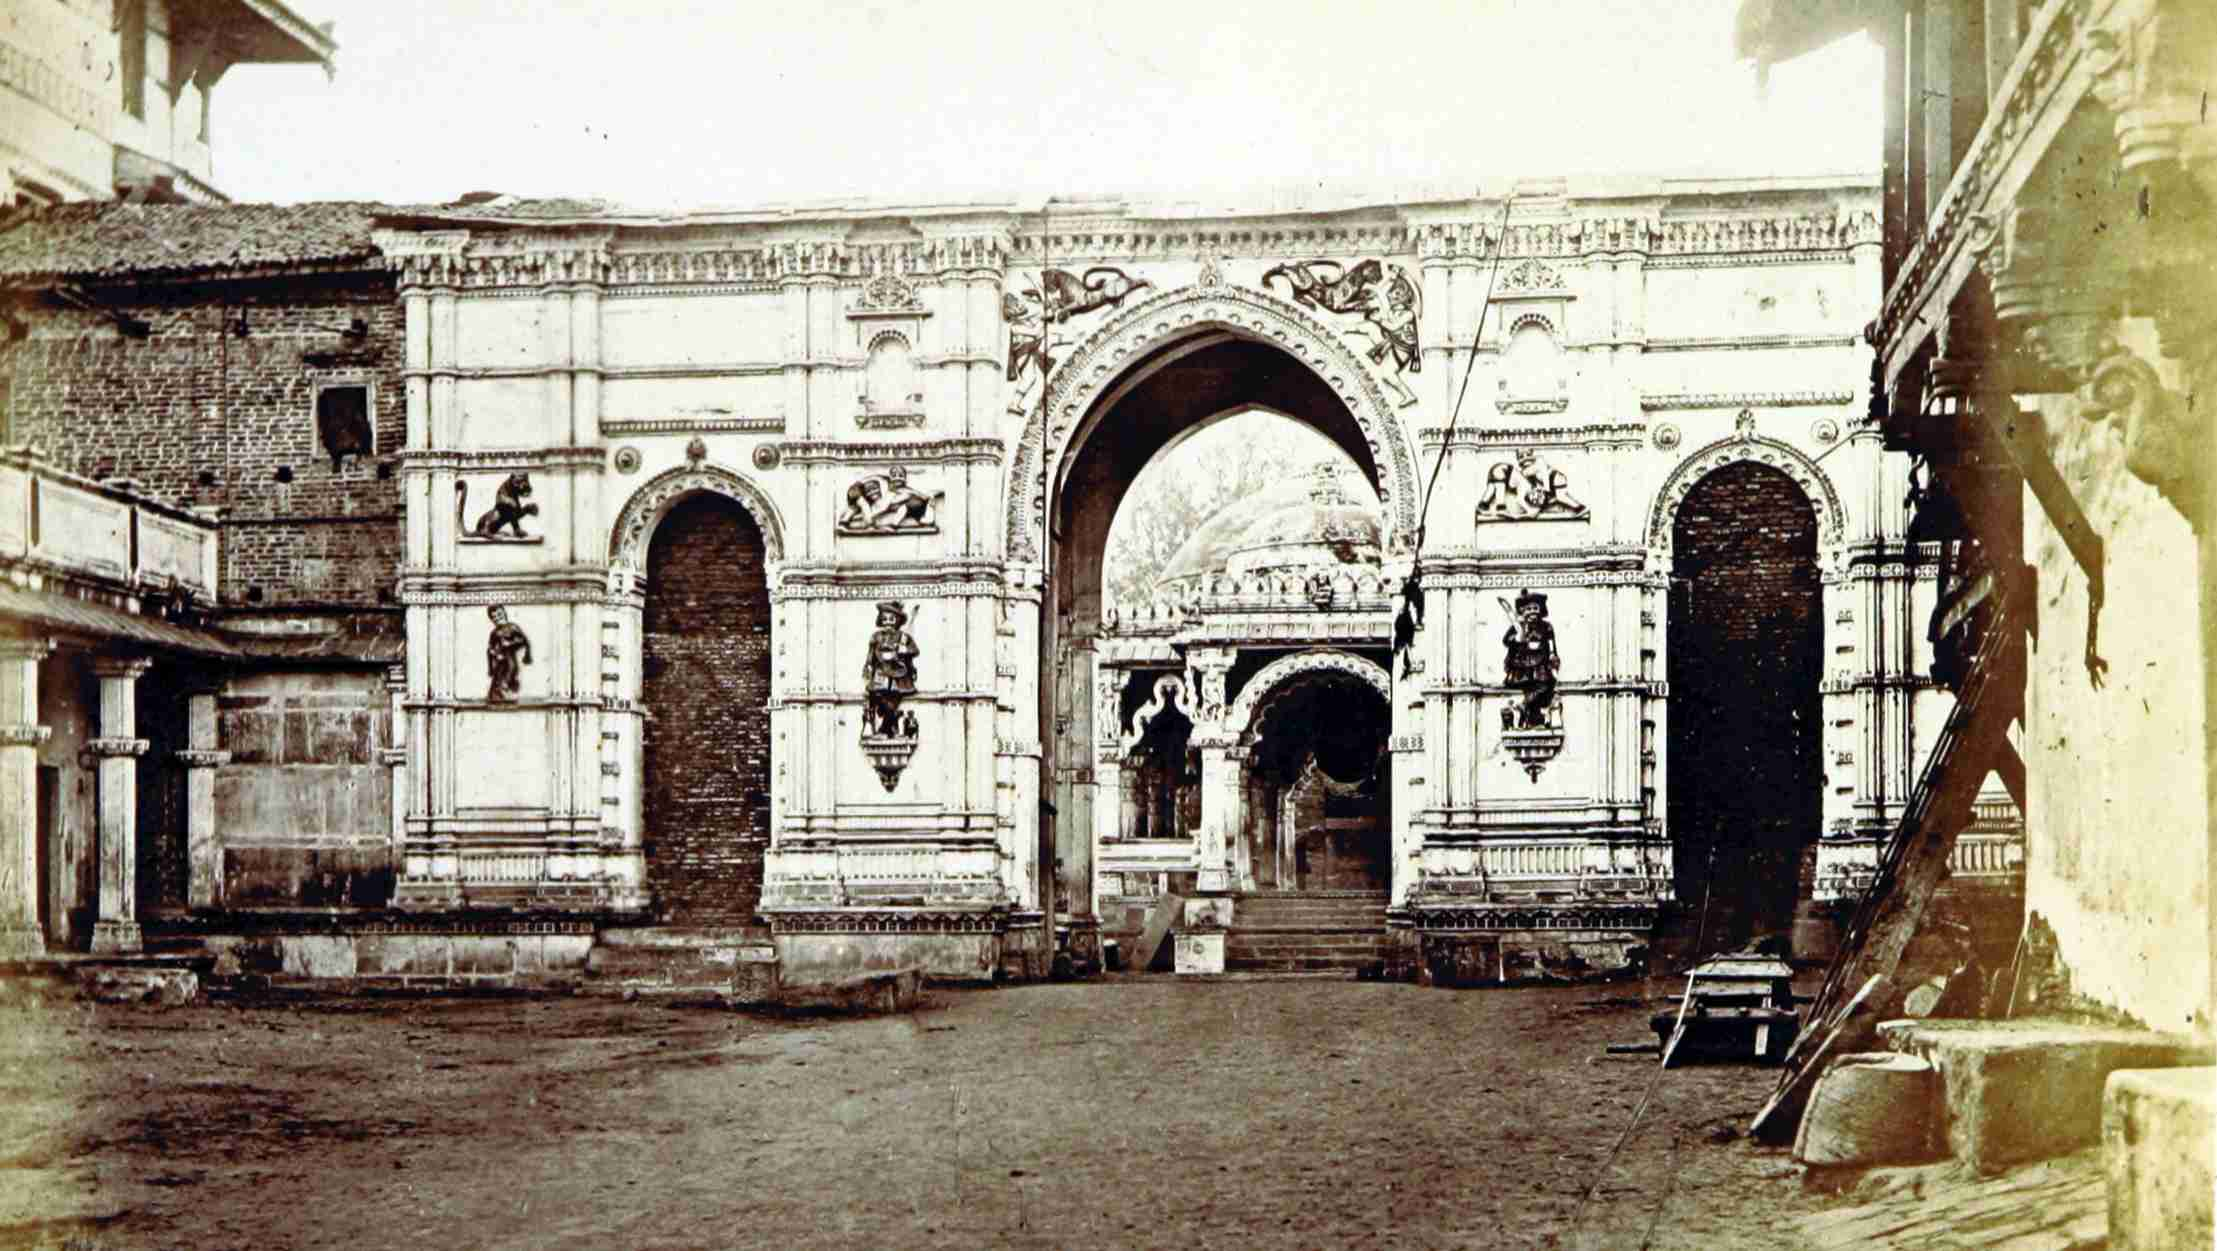 The story behind Ahmedabad City